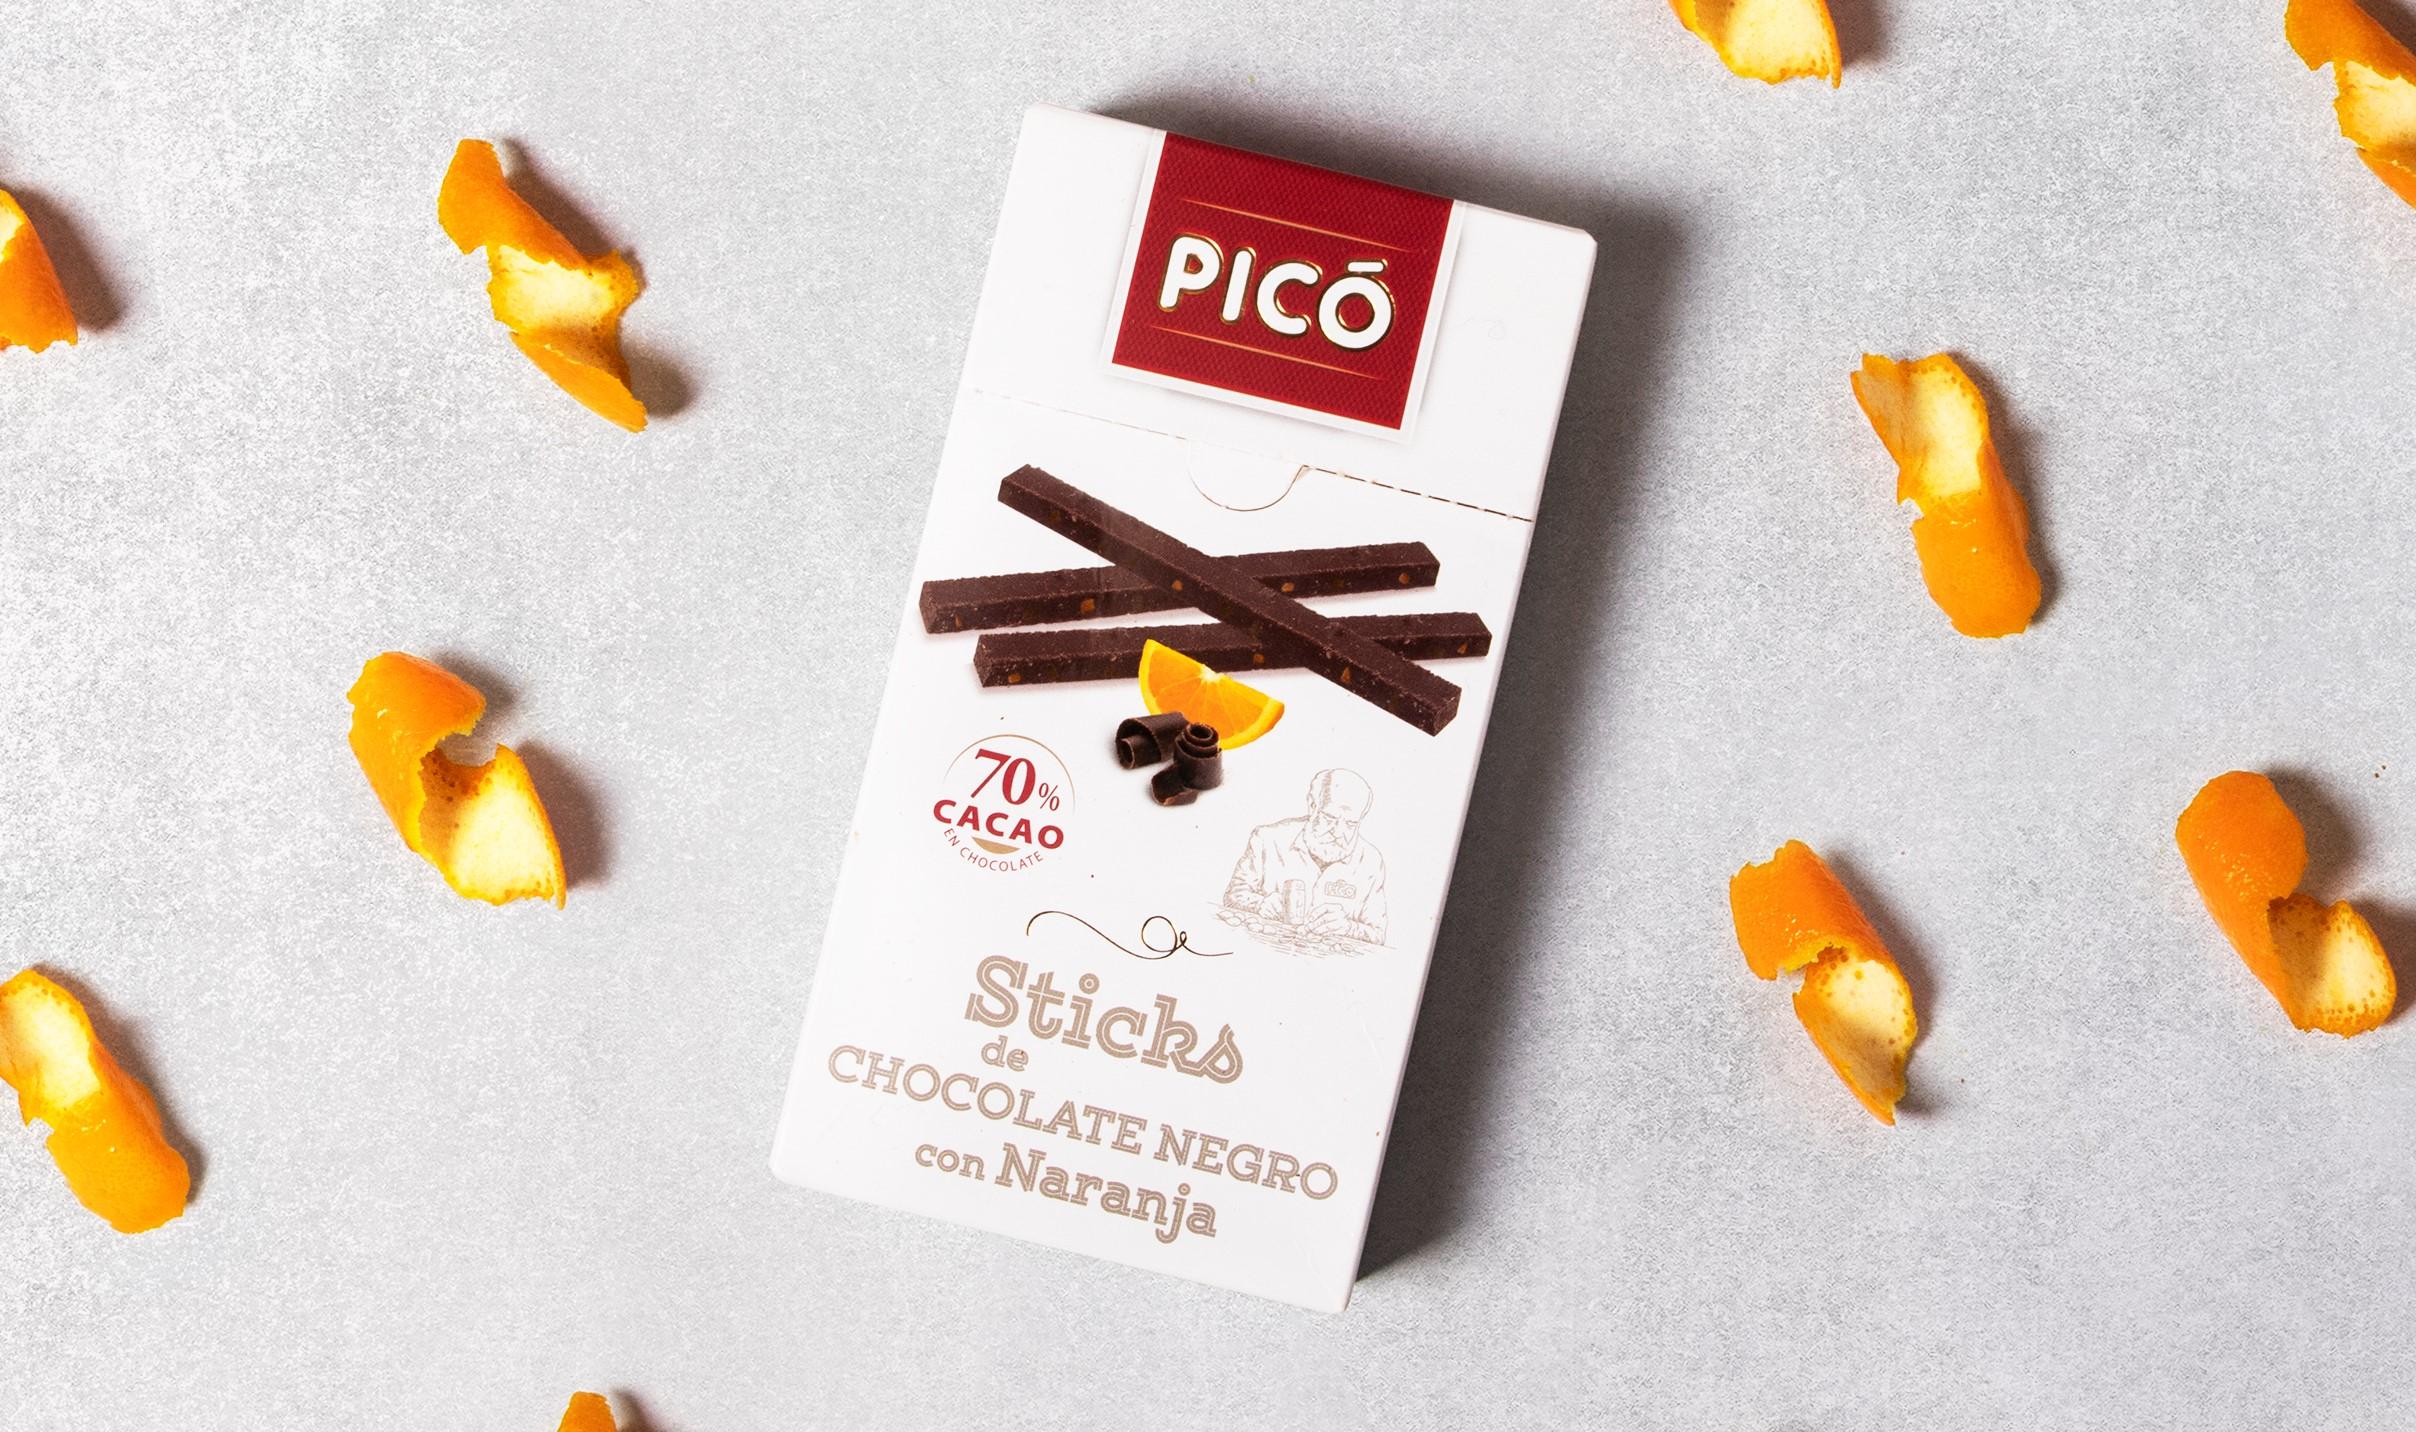 sticks de chocolate negro con naranja de Turrones Picó